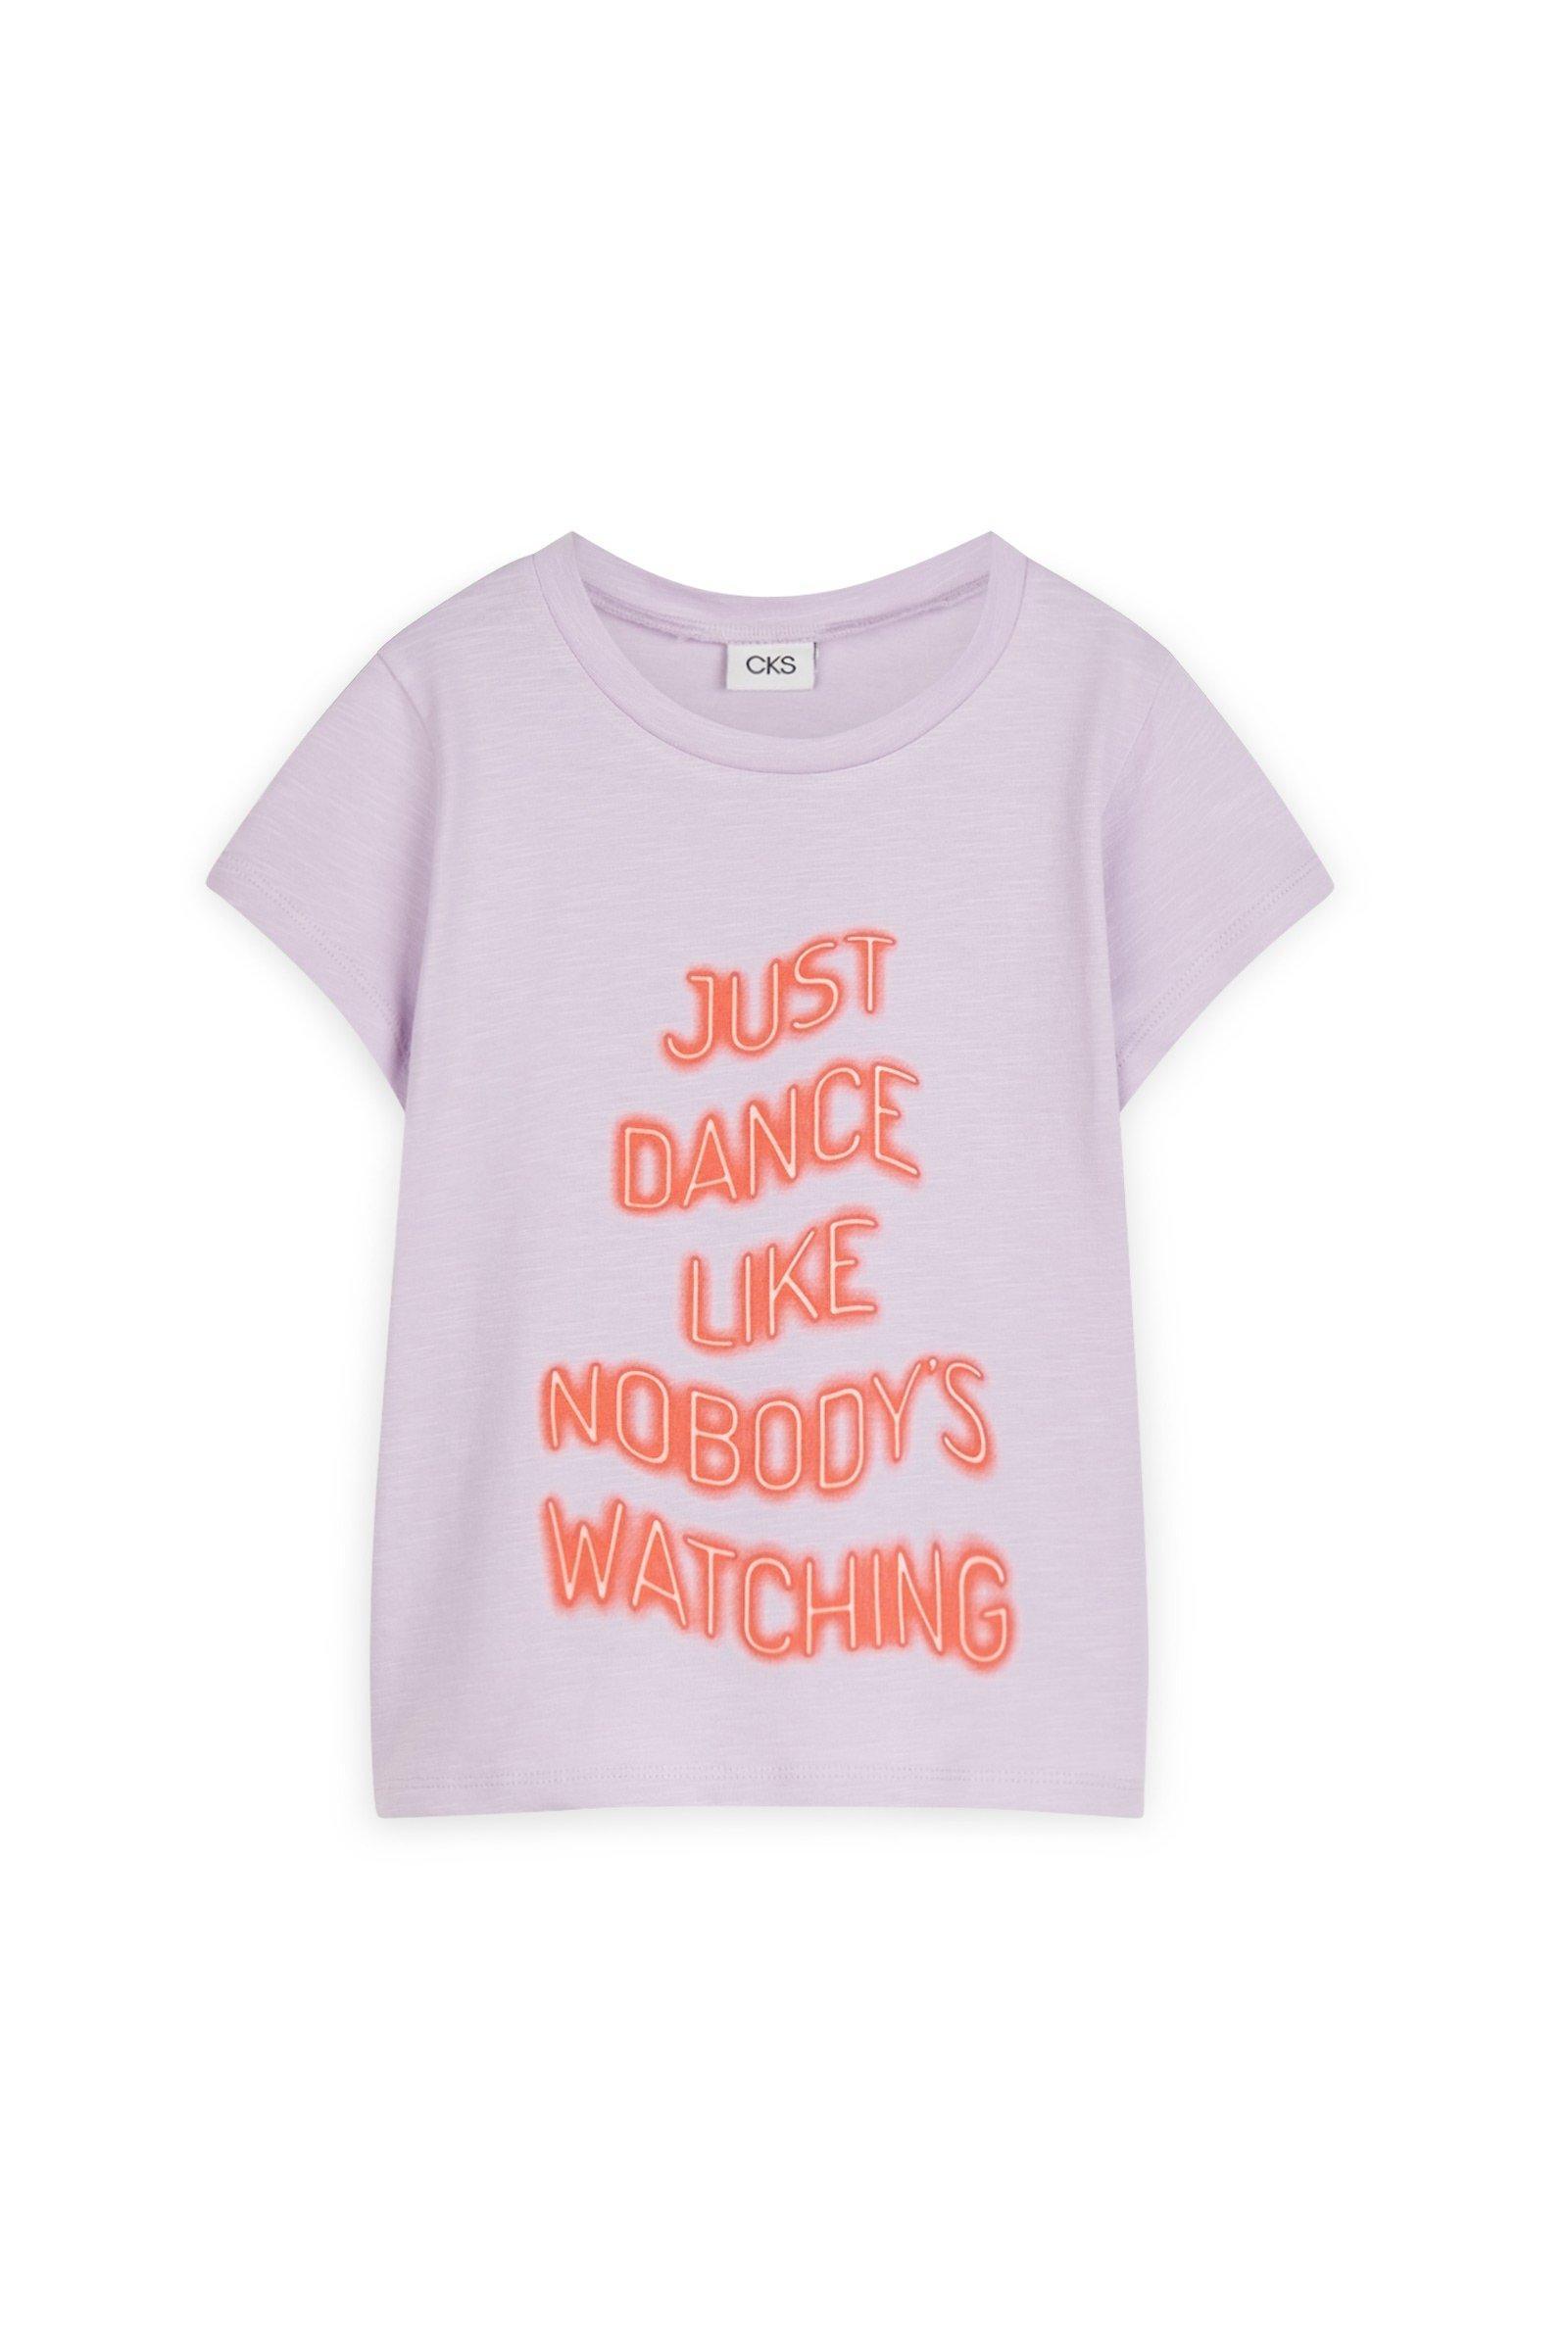 CKS Kids - WANDA - t-shirt korte mouwen - roze